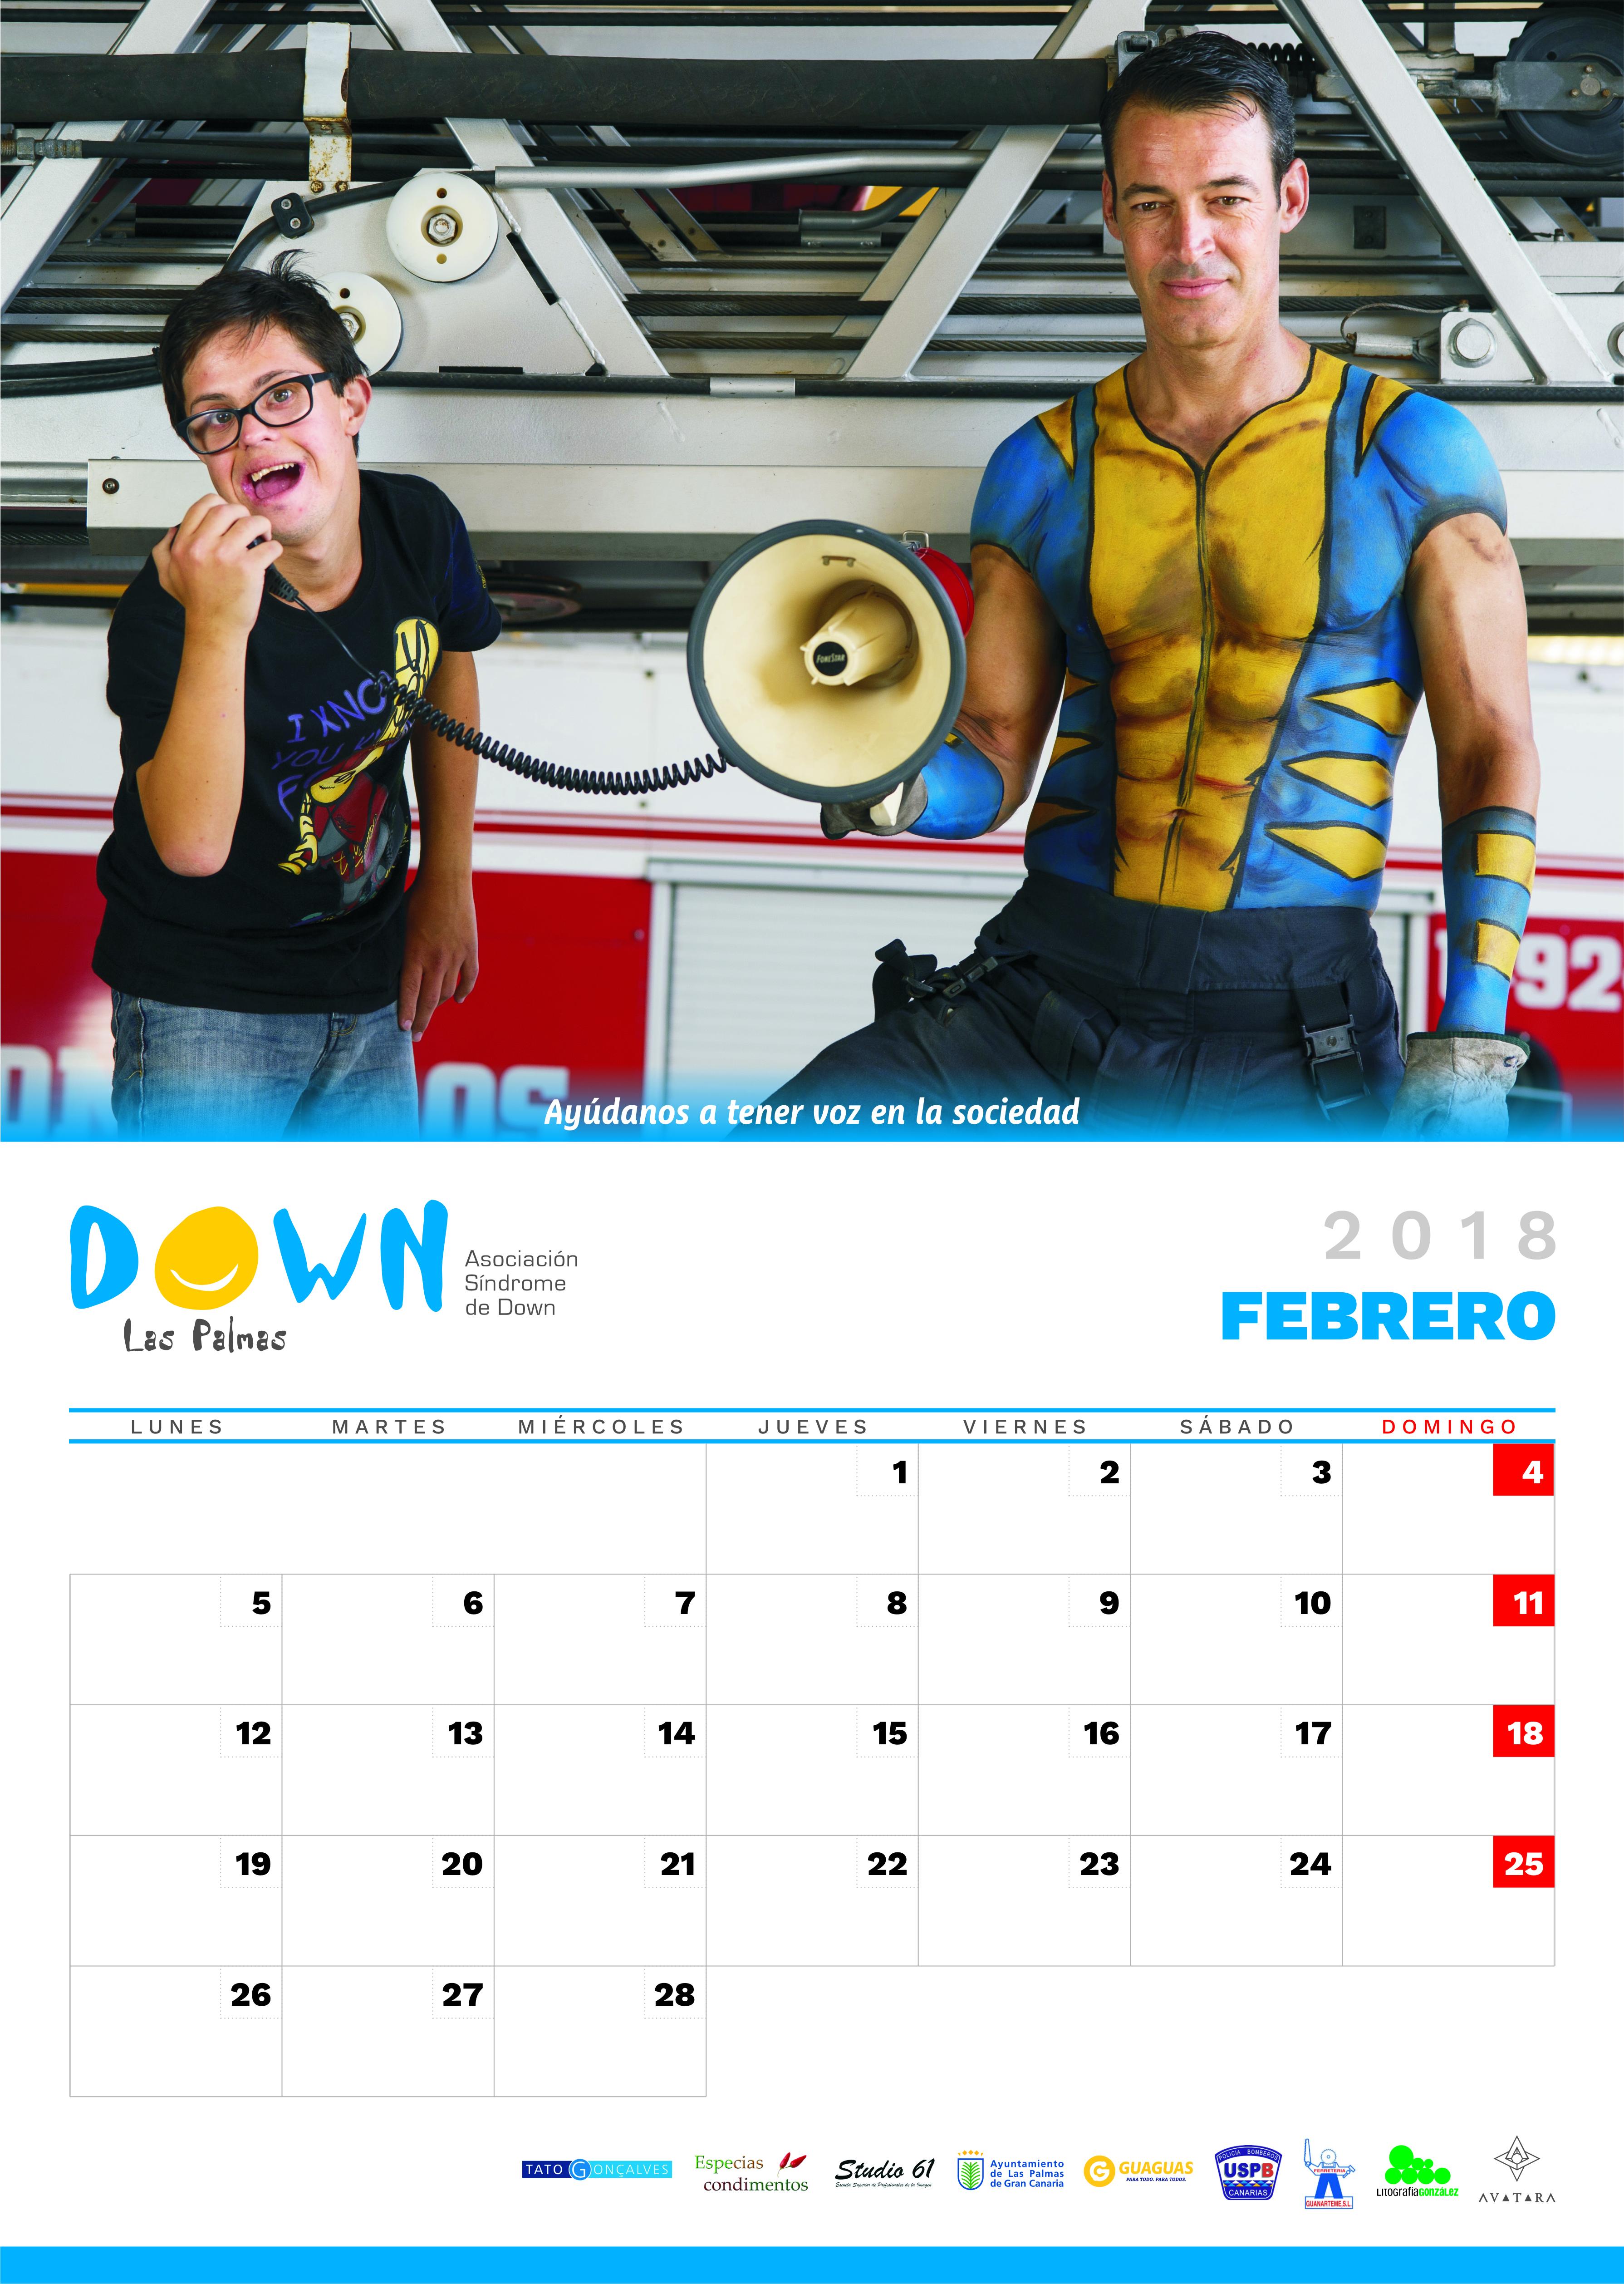 Calendario Palmas.Calendario 2018 Down Las Palmas Down Espana